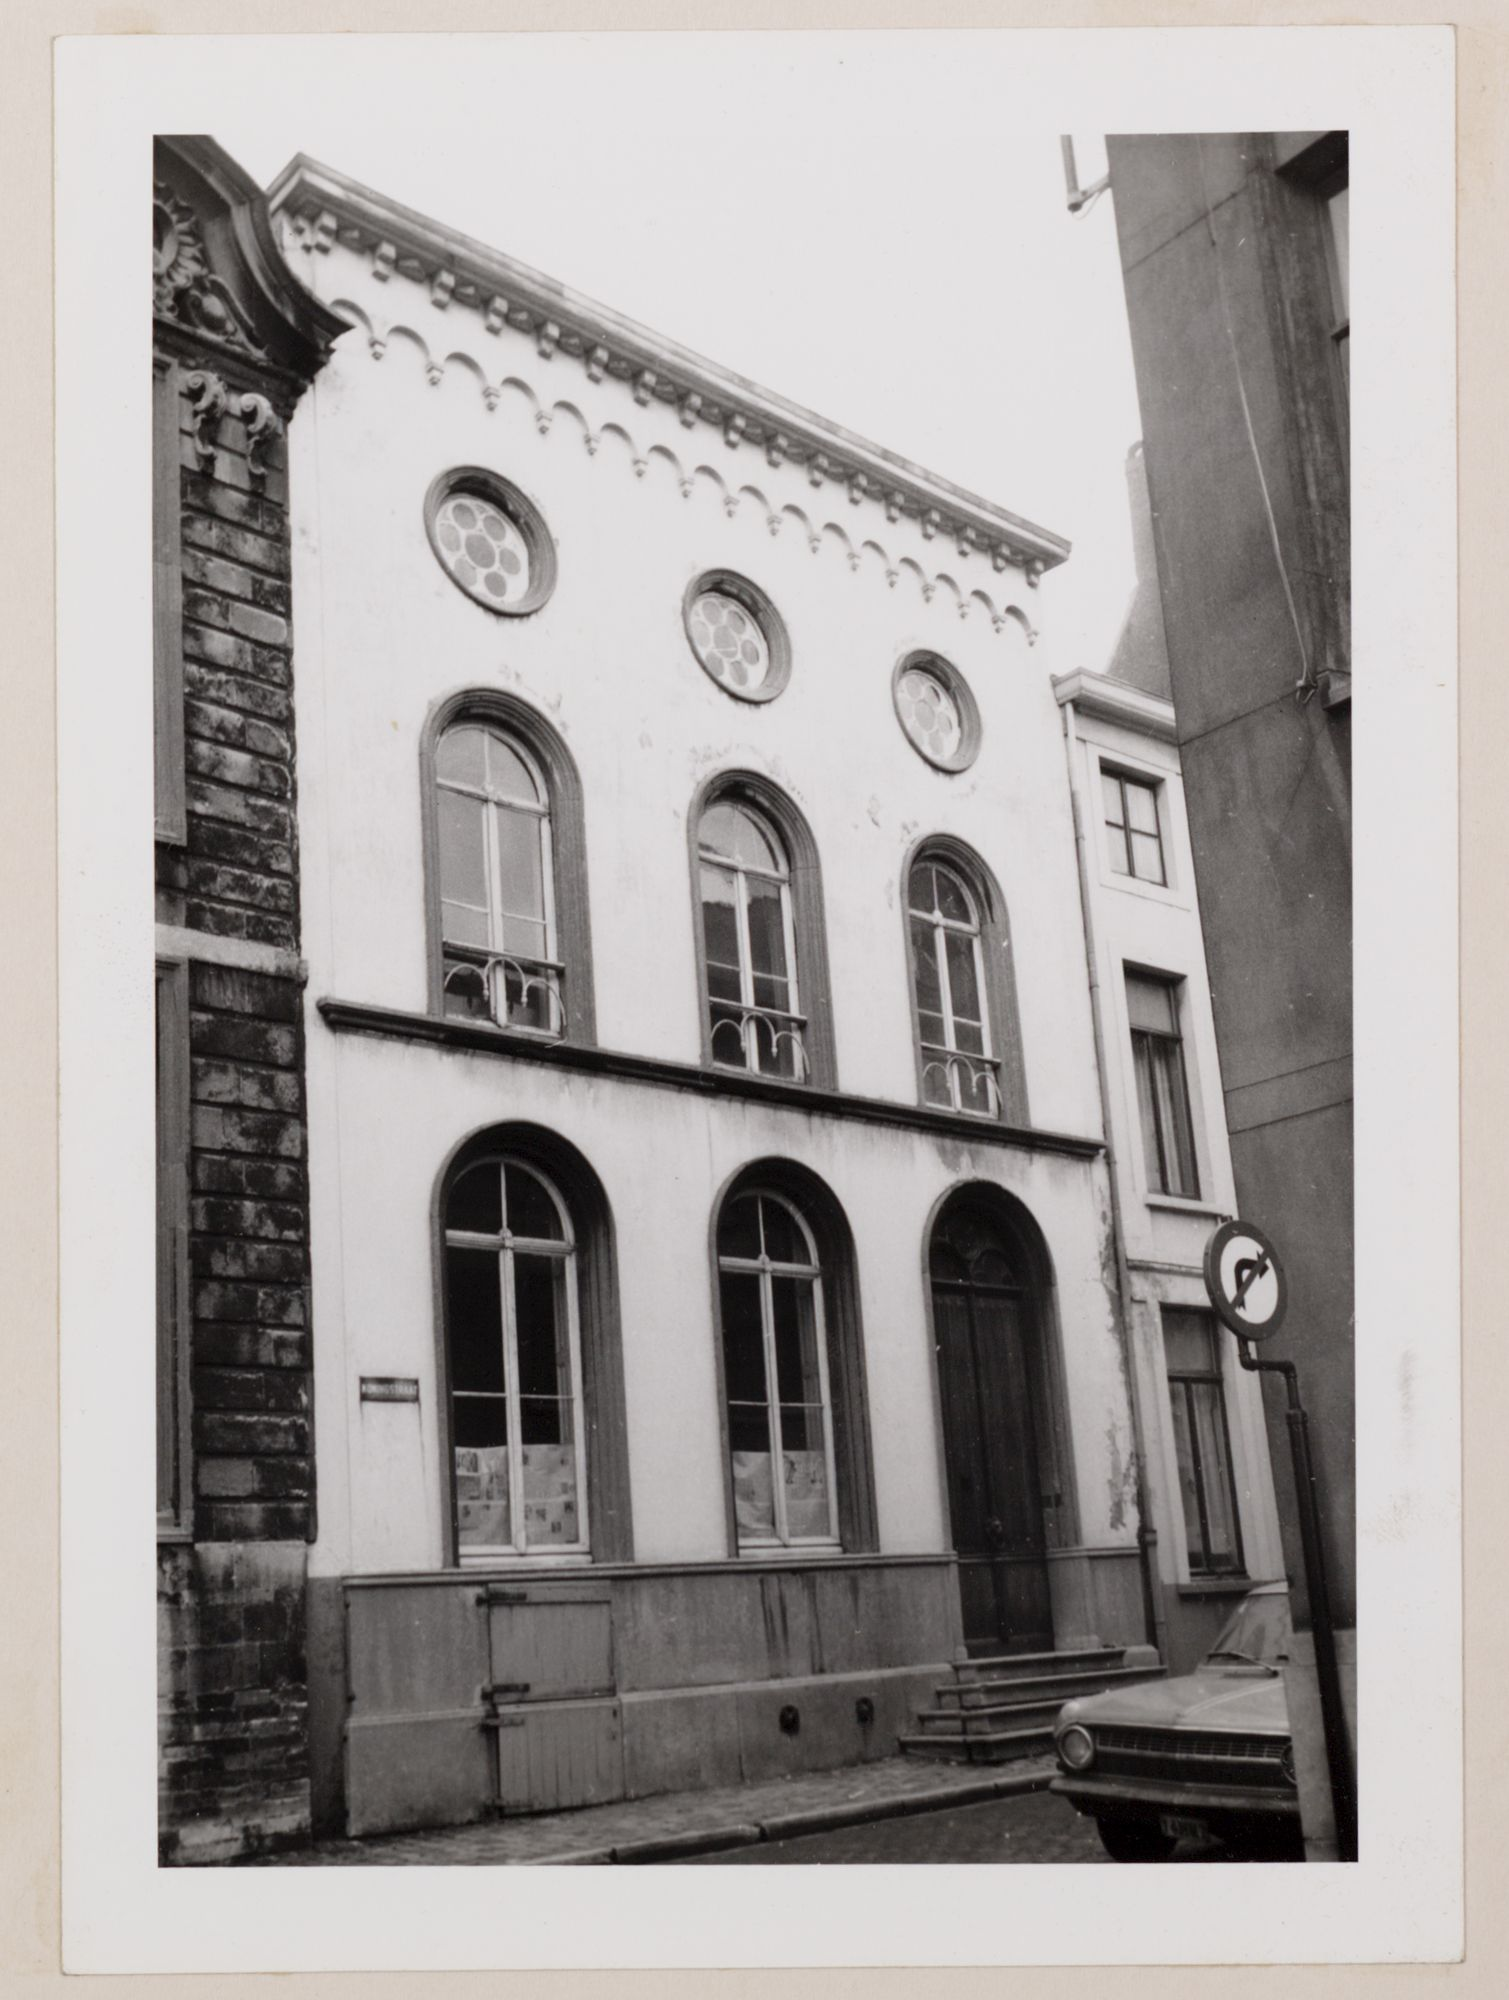 Gent: Koningstraat